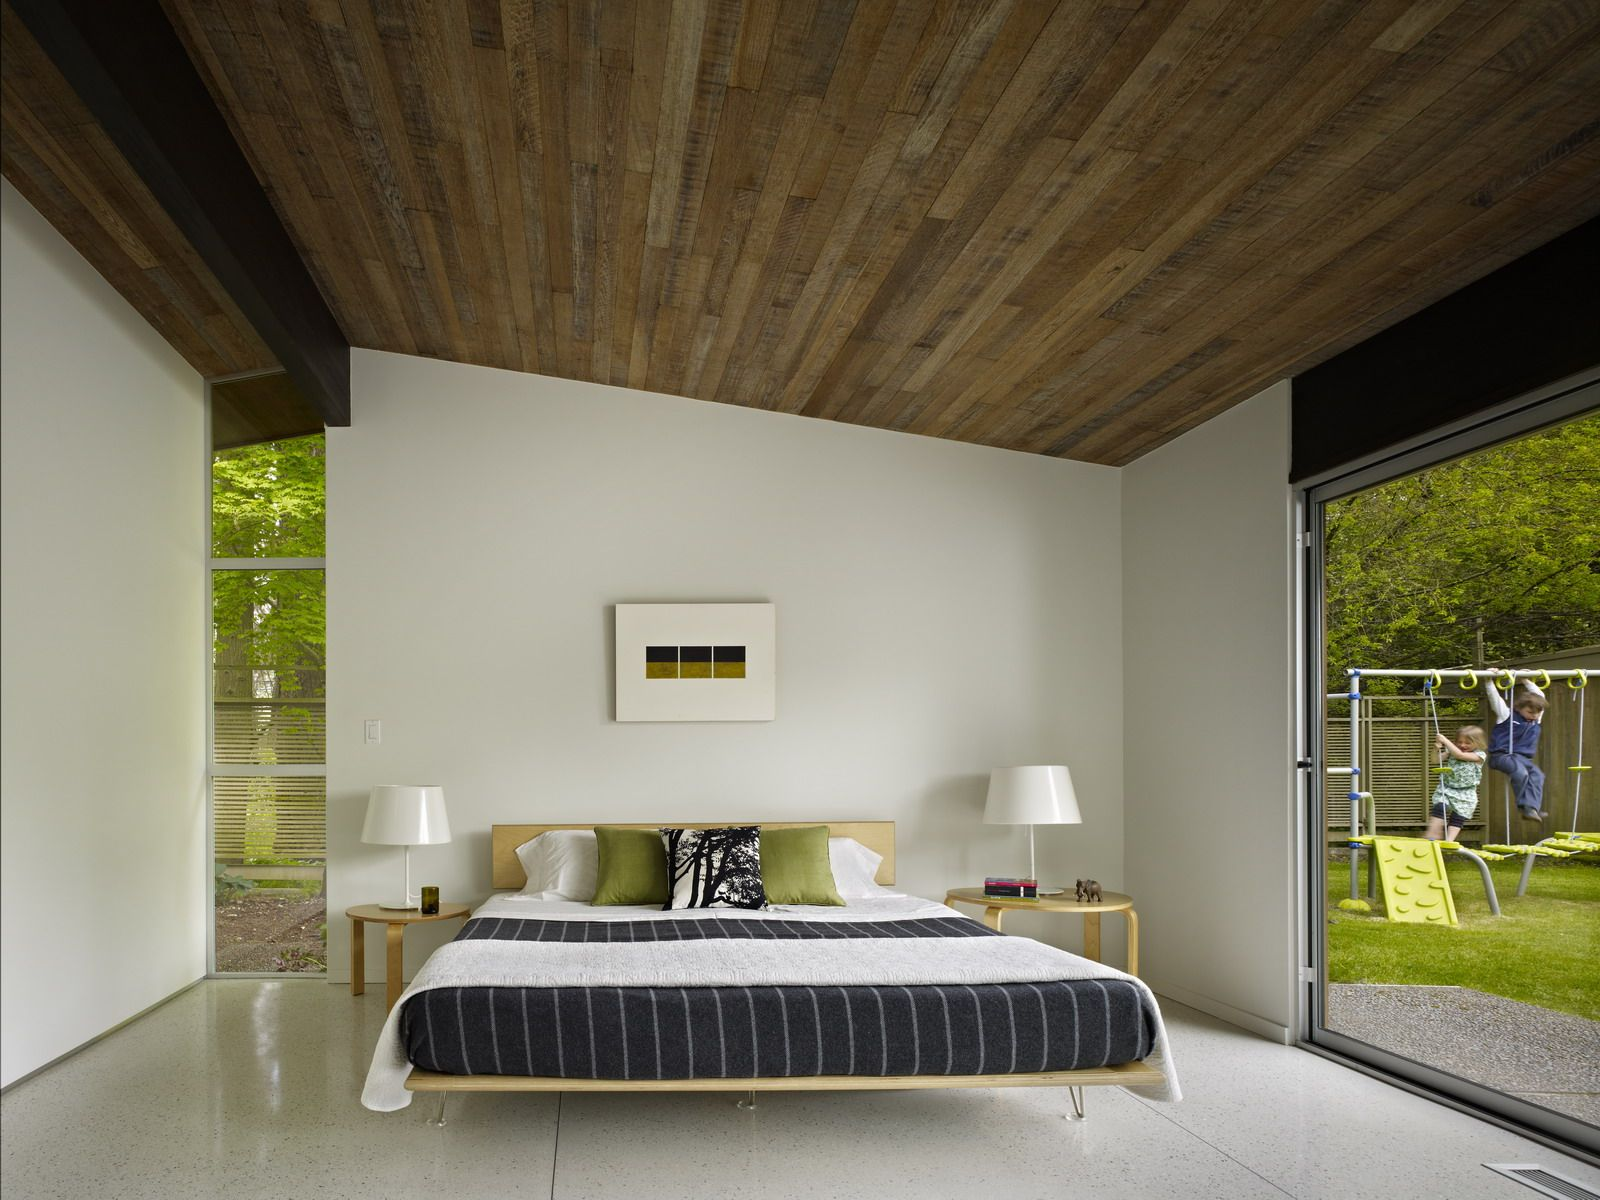 Matteoli Mobili ~ 5 midcentury renovations we love dwell interior architecture